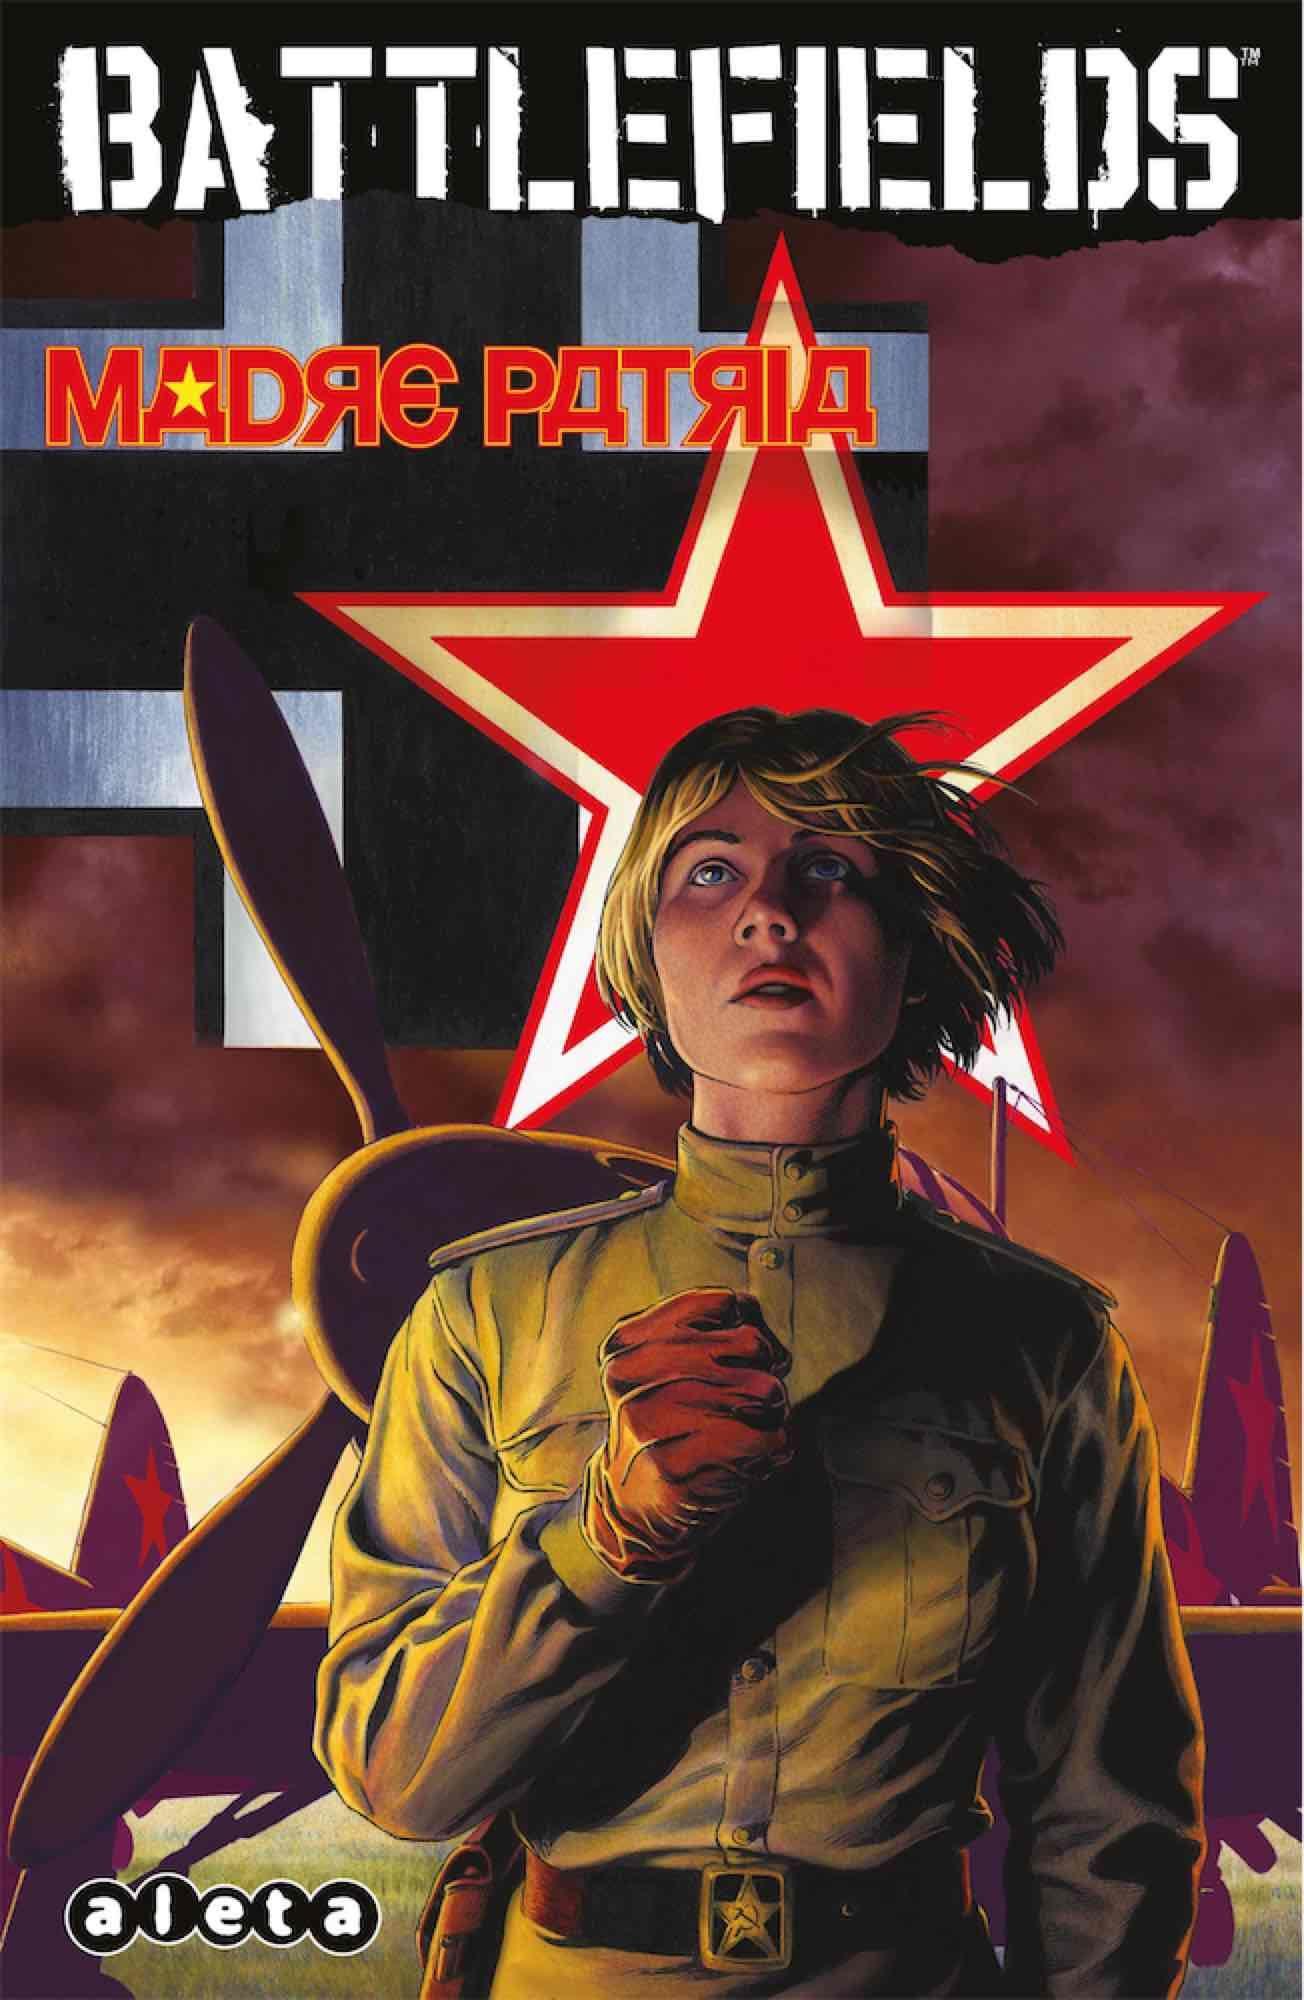 BATTLEFIELDS VOL 6 MADRE PATRIA